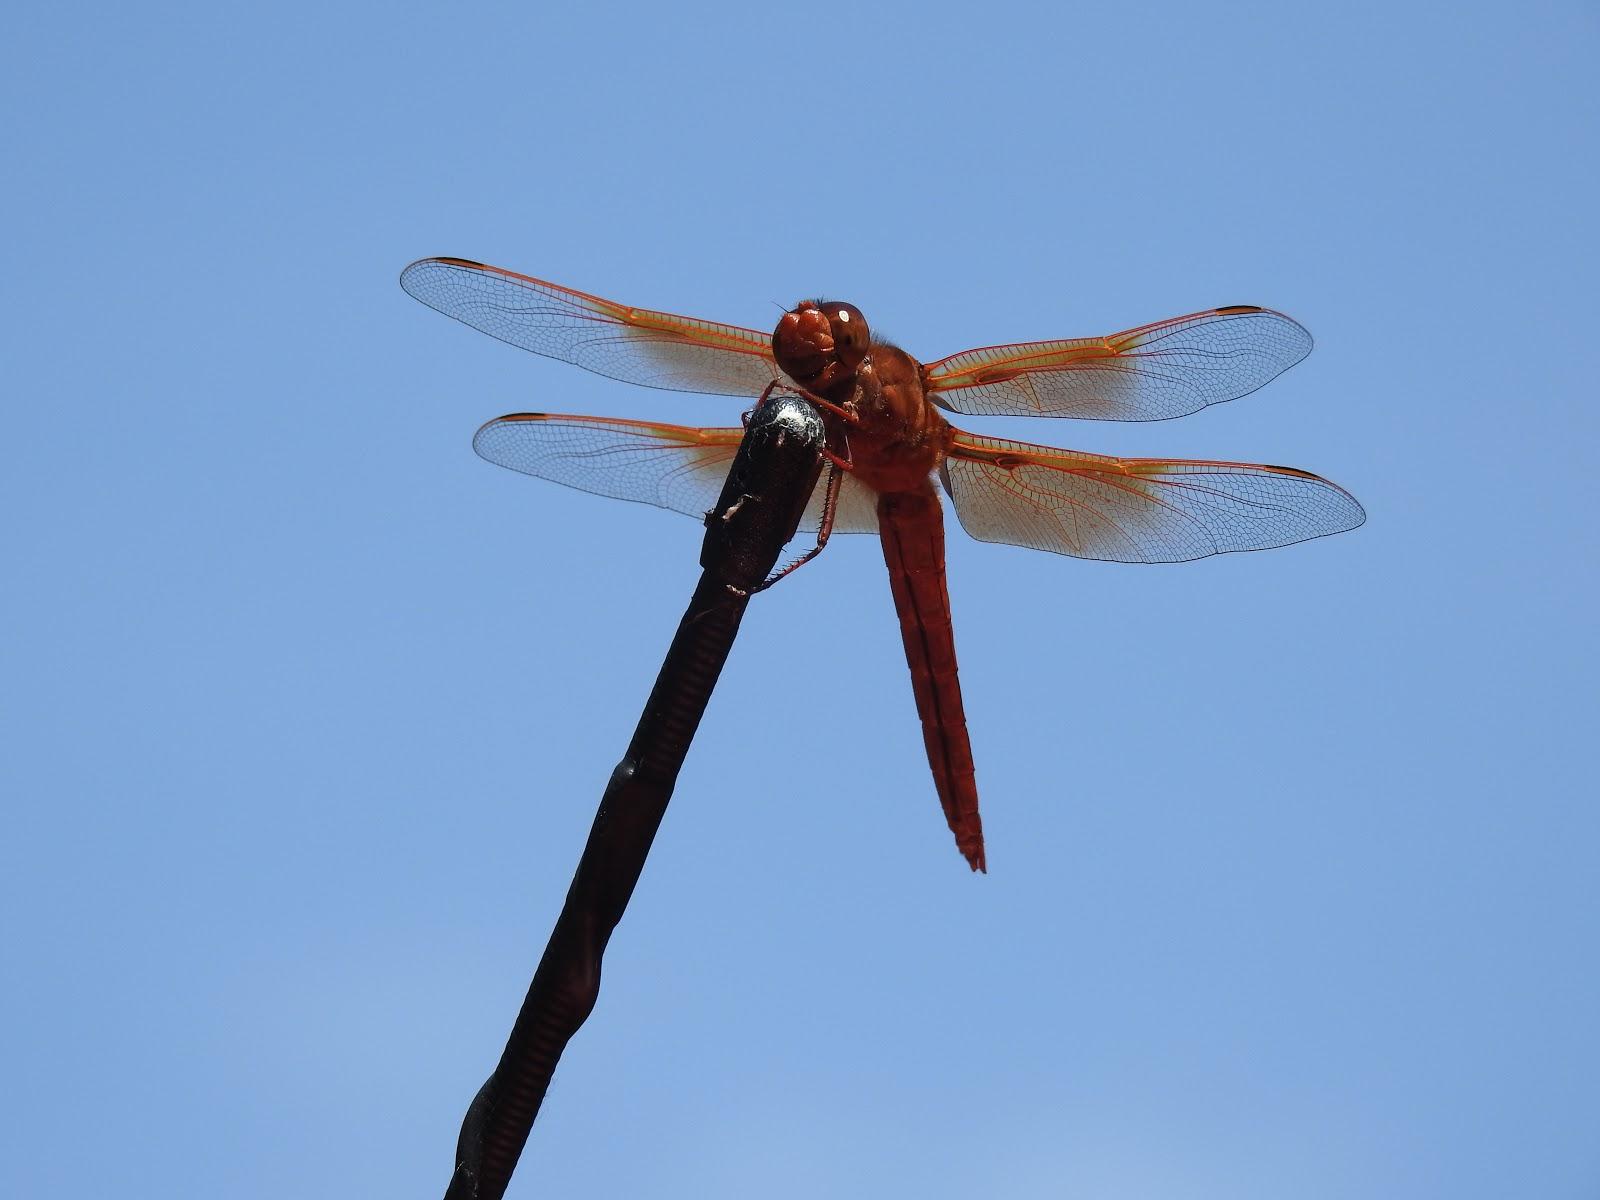 Broken Winged Crane Epub